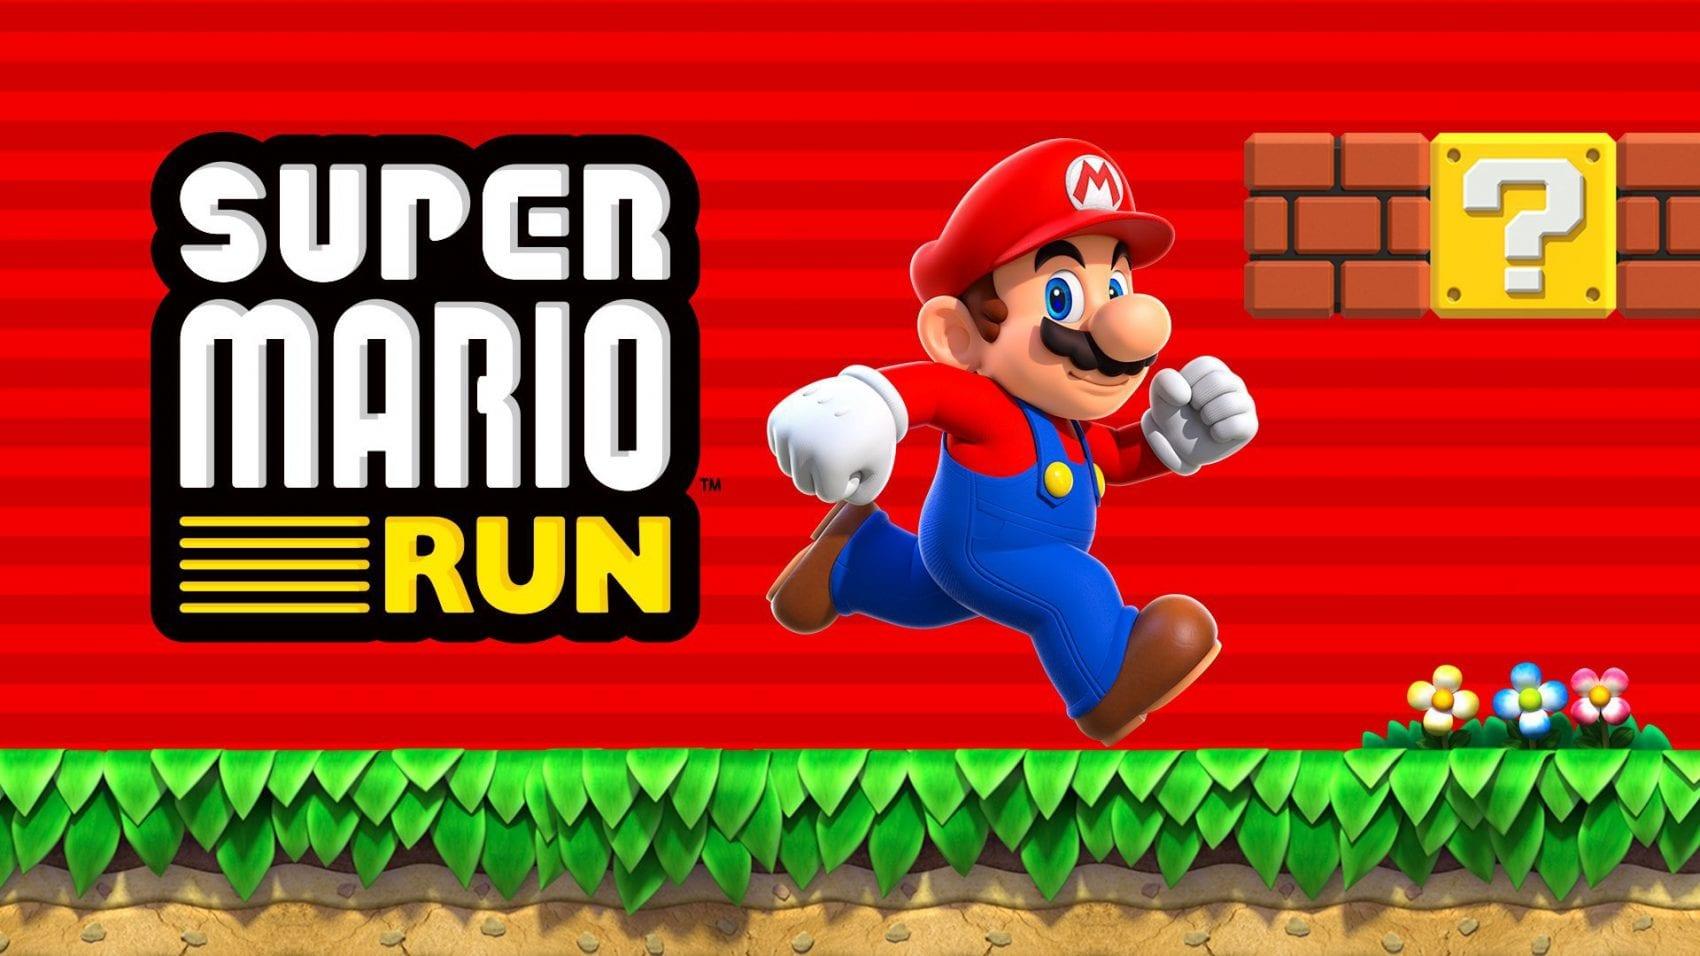 super-mario-run-news-my-geek-actu-6